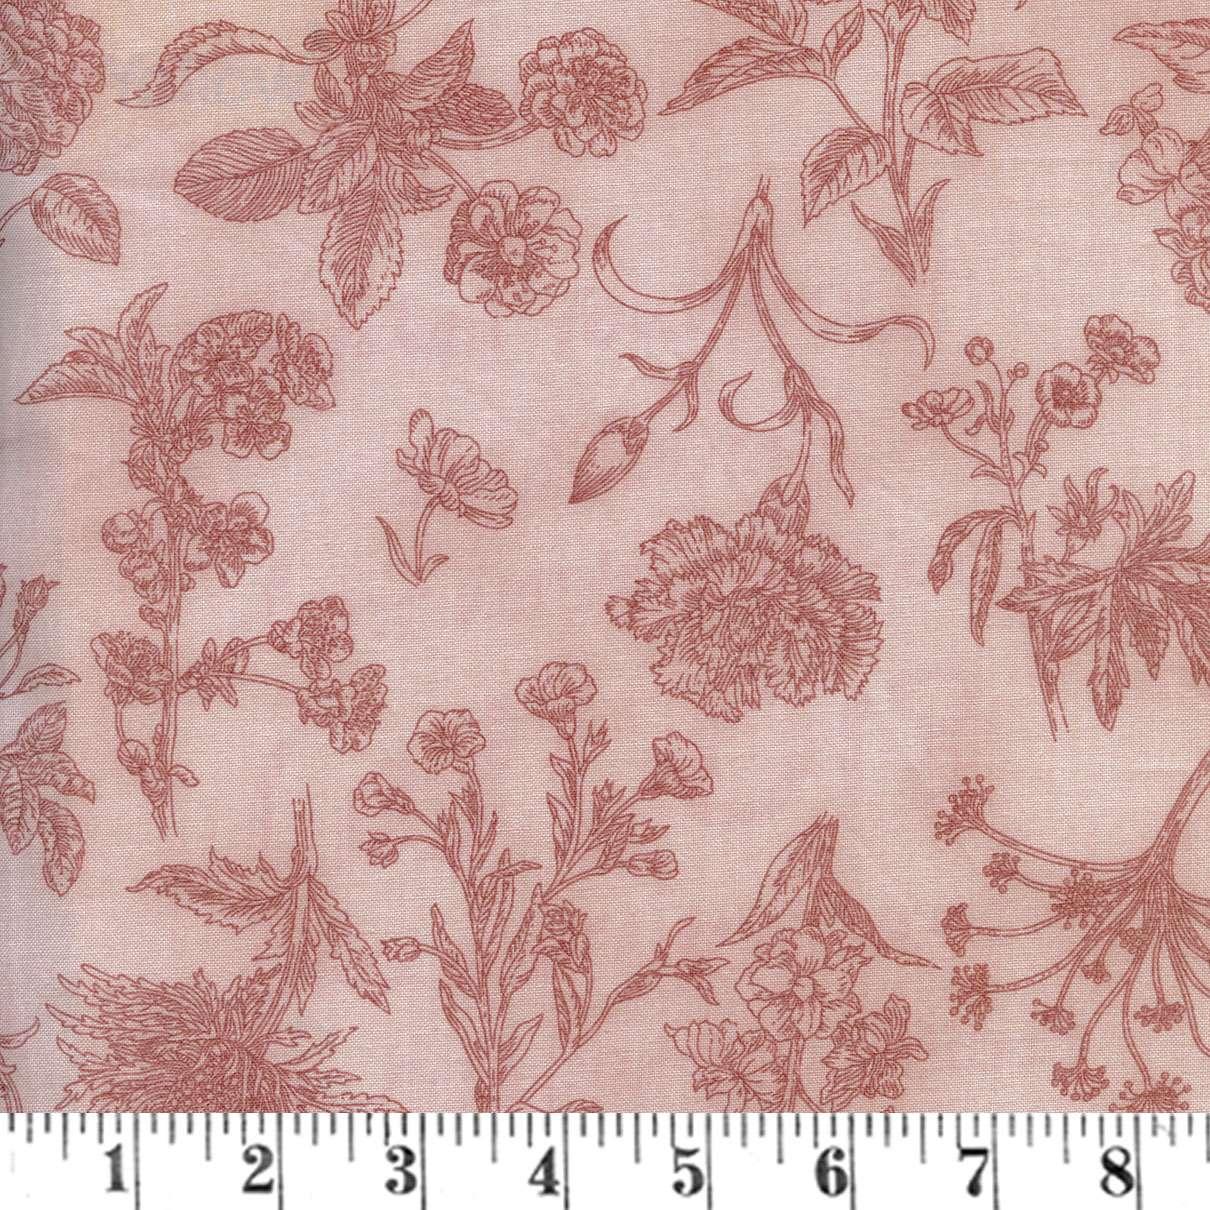 V117 Field Notes - floral tone-on-tone dusky peach